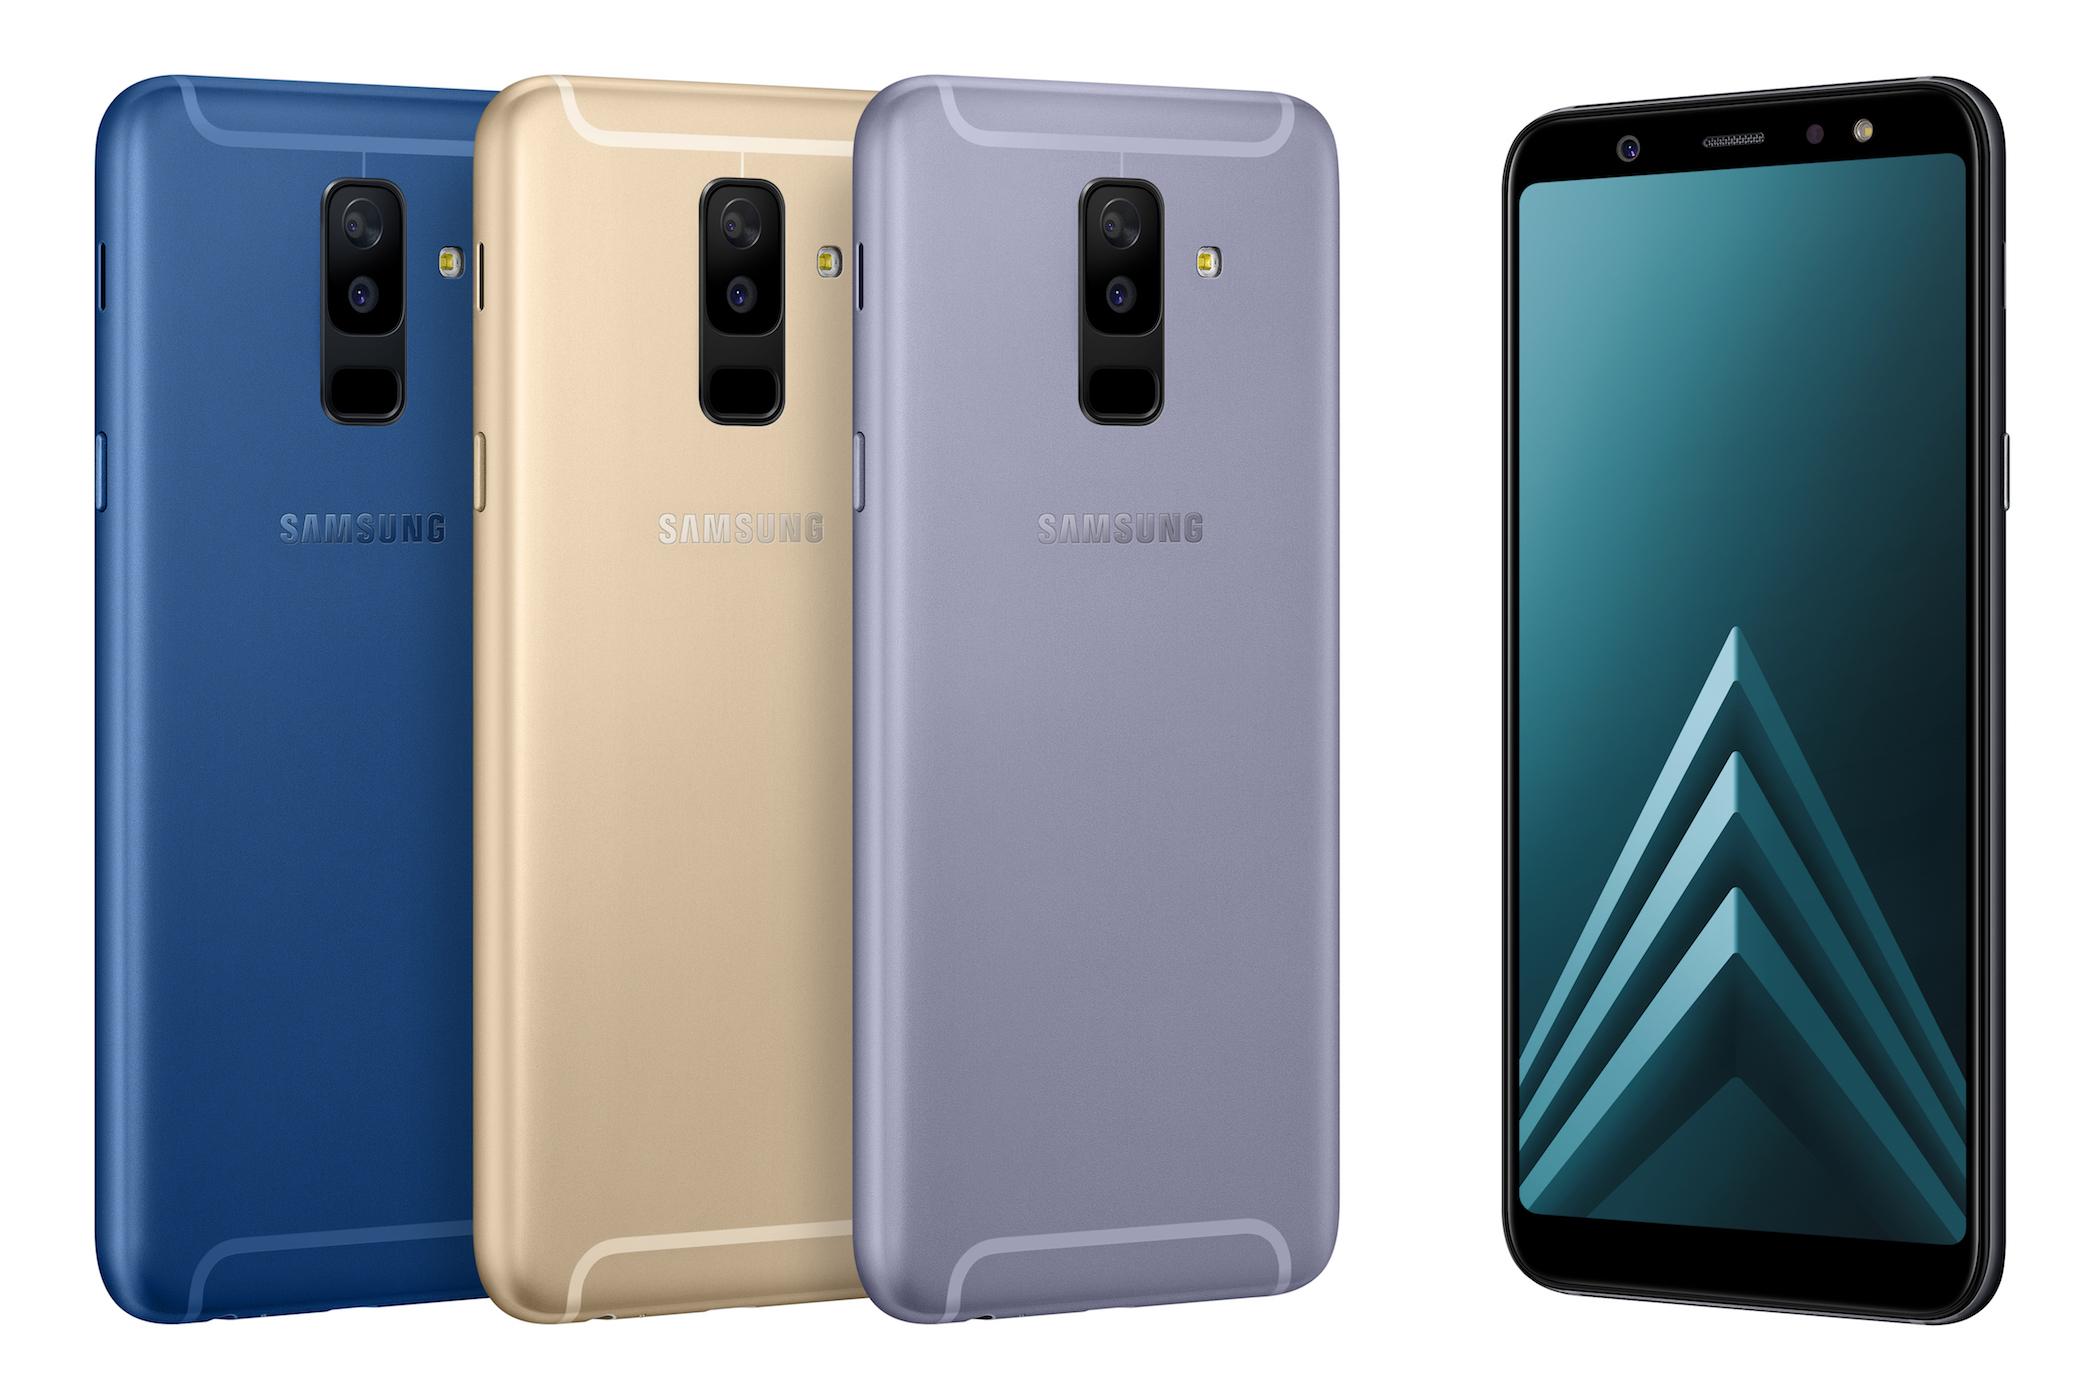 2019 year looks- Stylish samsung phones